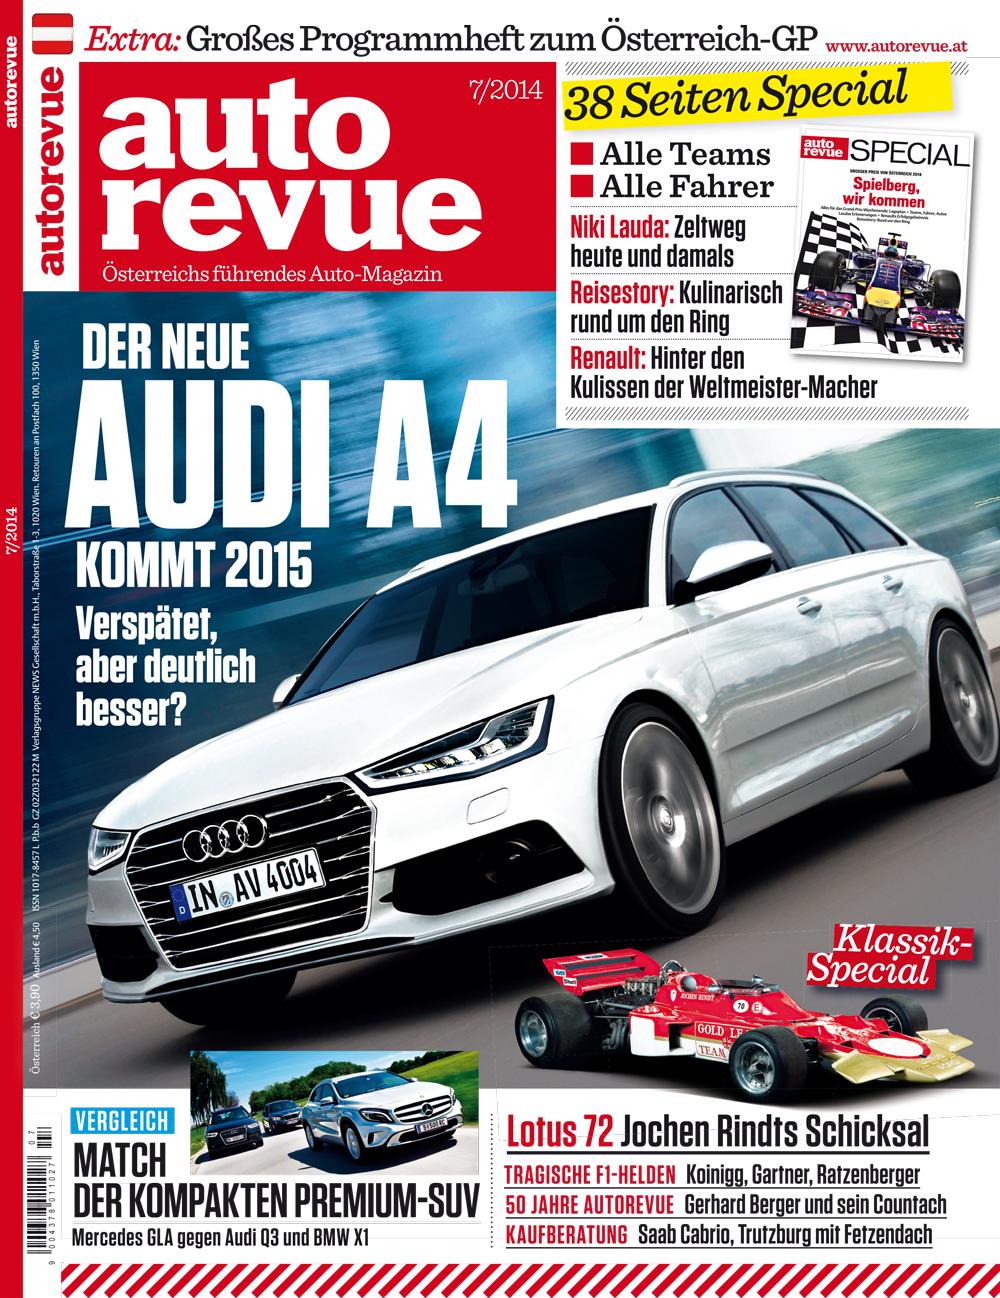 aure2014-07_cover